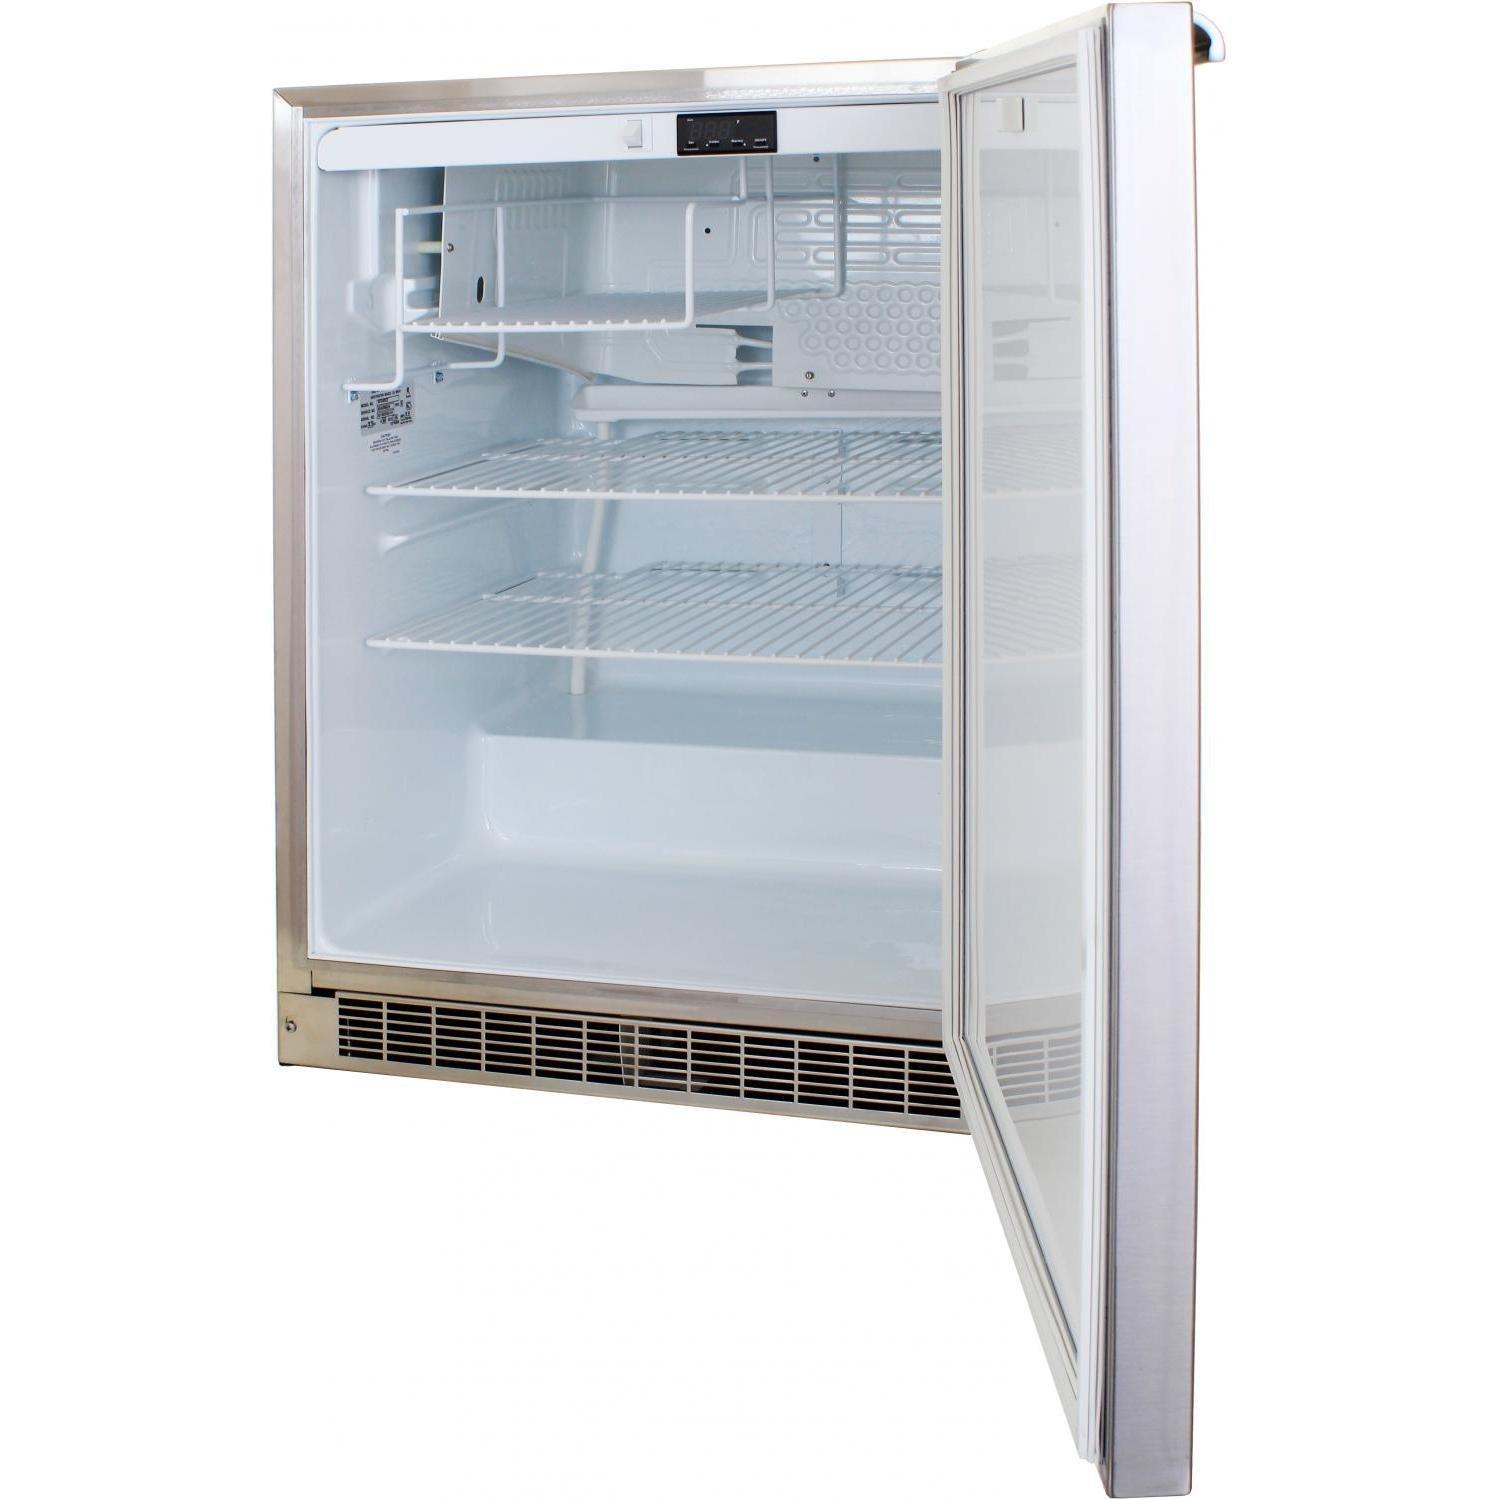 Refrigerator Outdoor Amazoncom Dcs Rf24re3 24 Energy Star Outdoor Refrigerator With